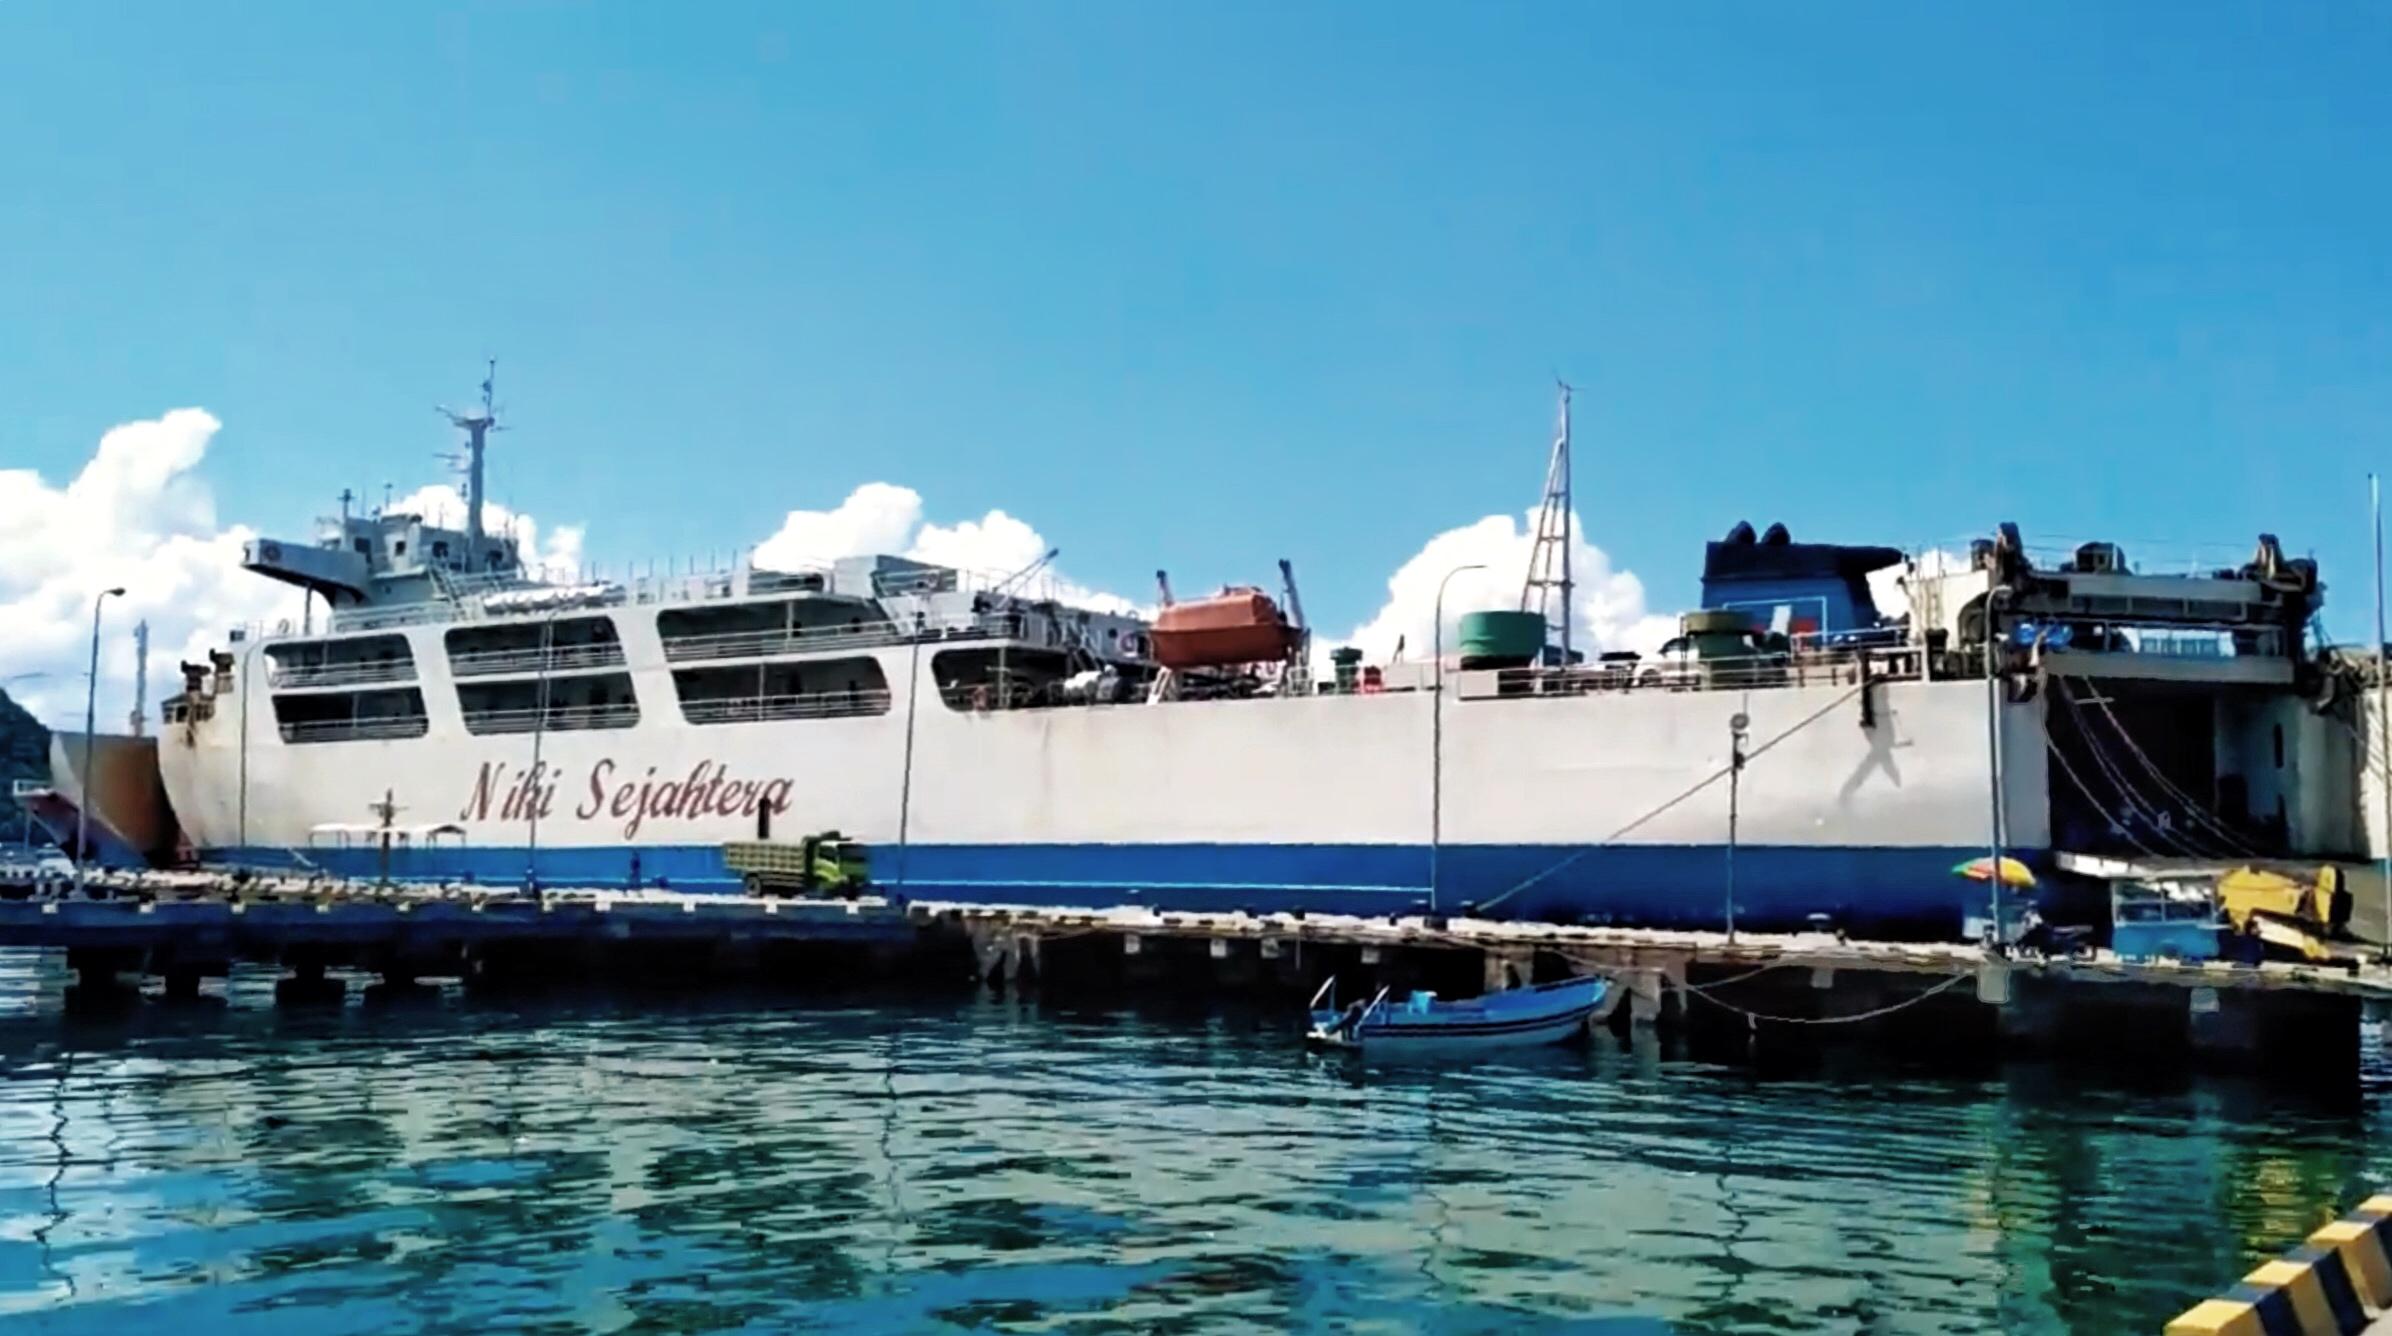 Km Niki Sejahtera Penyeberangan Surabaya Labuan Bajo